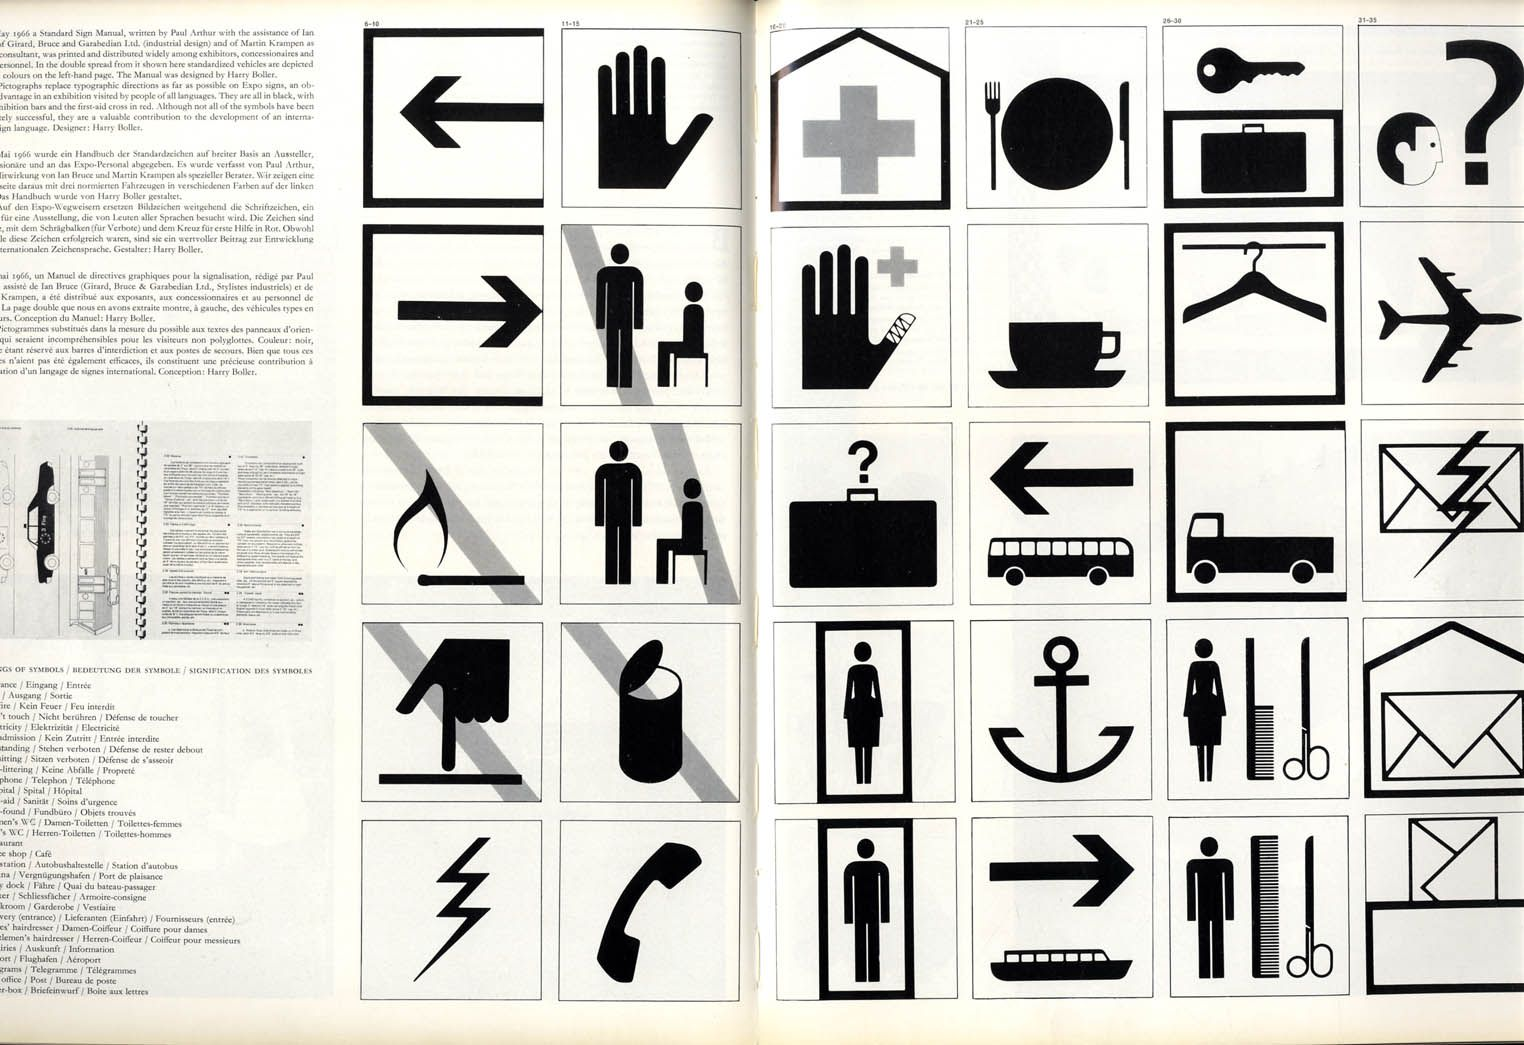 Visual Codes | Visual Thinking - Dyslexic | Pinterest